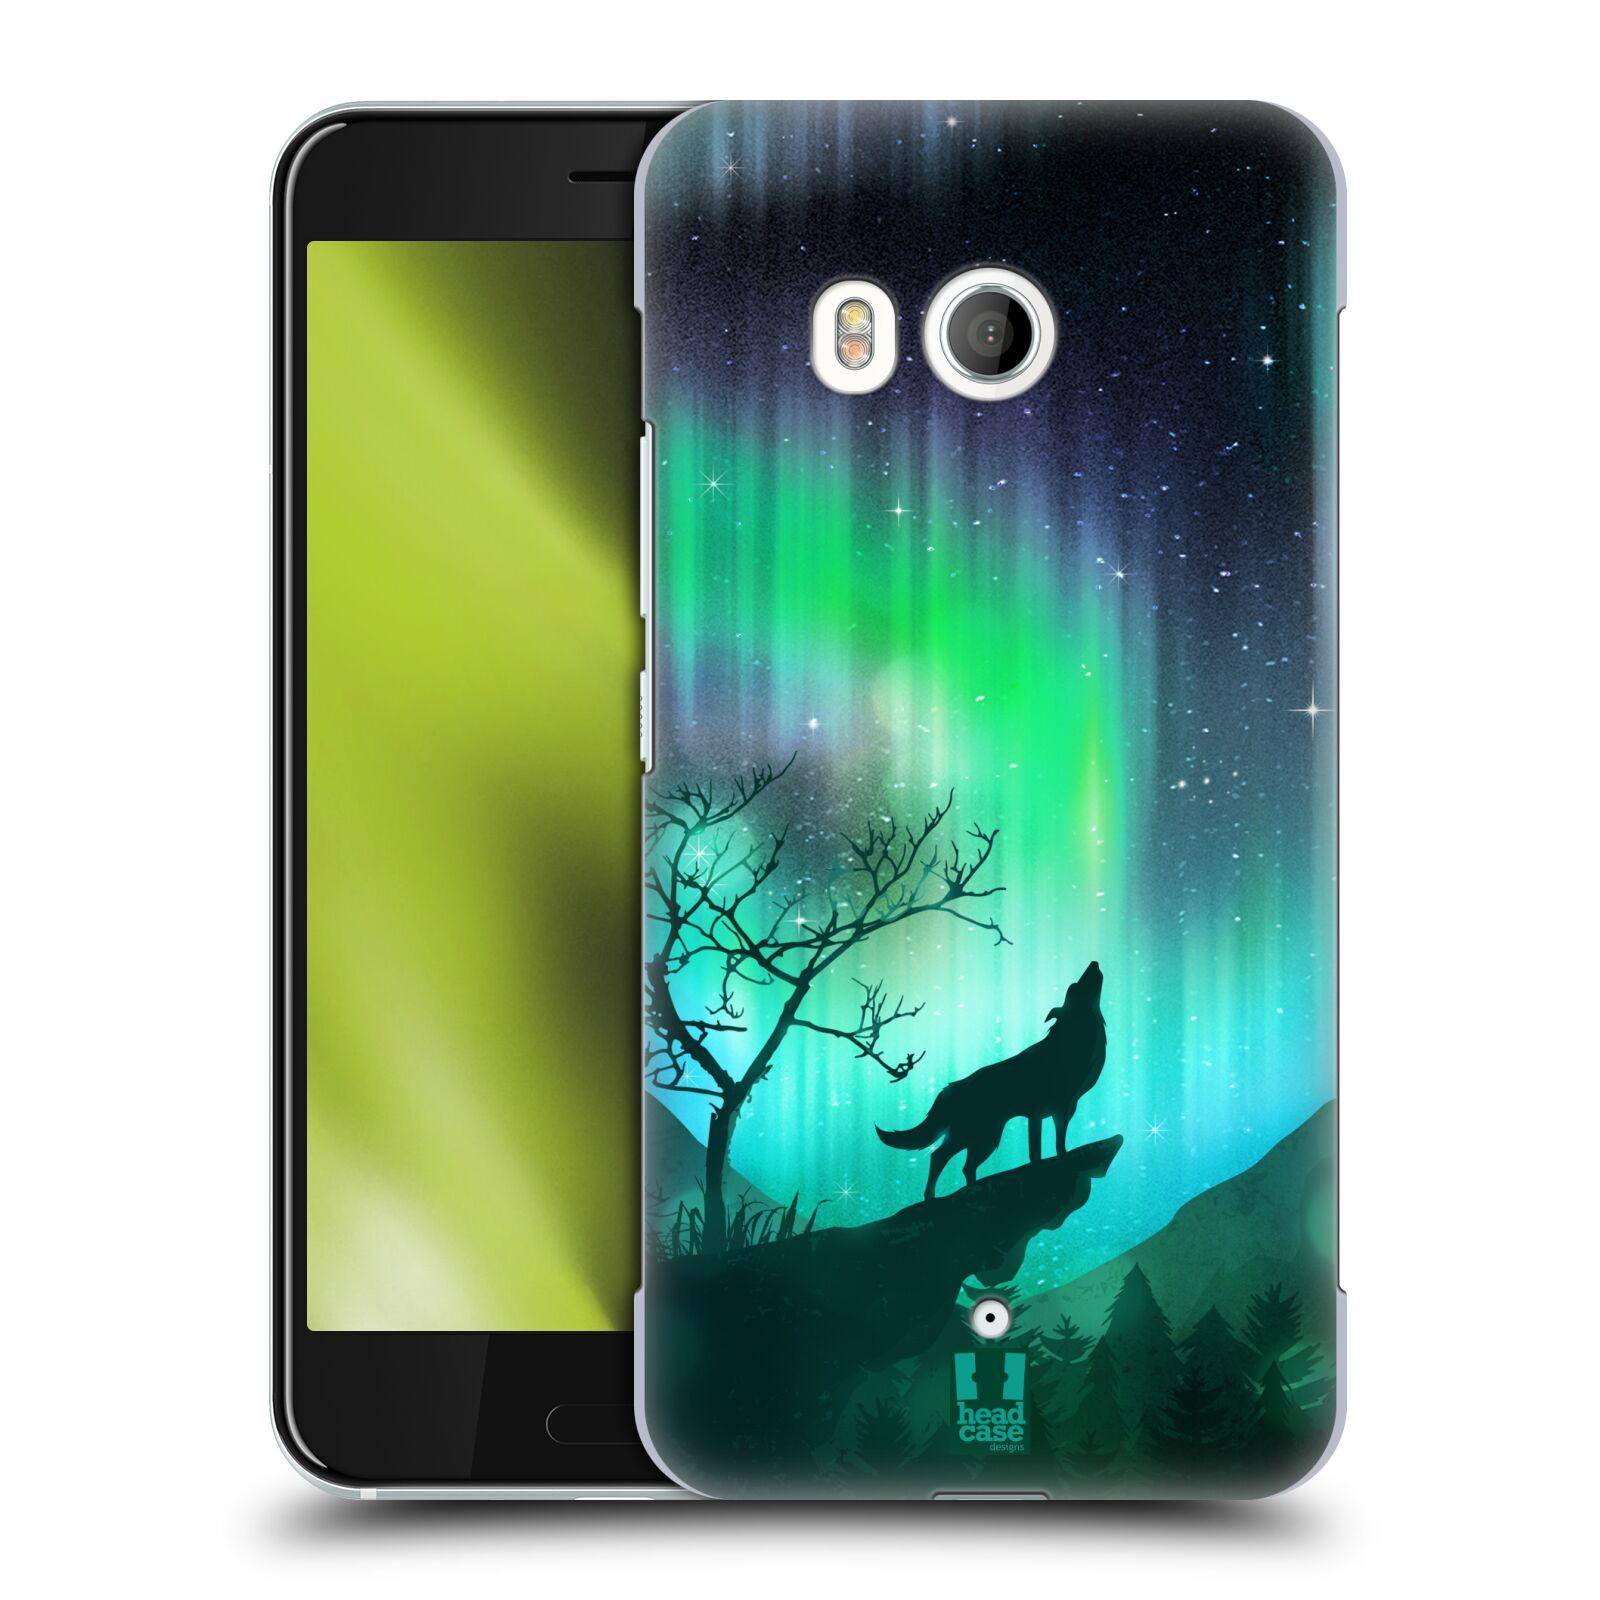 HEAD-CASE-DESIGNS-NORTHERN-LIGHTS-HARD-BACK-CASE-FOR-HTC-PHONES-1